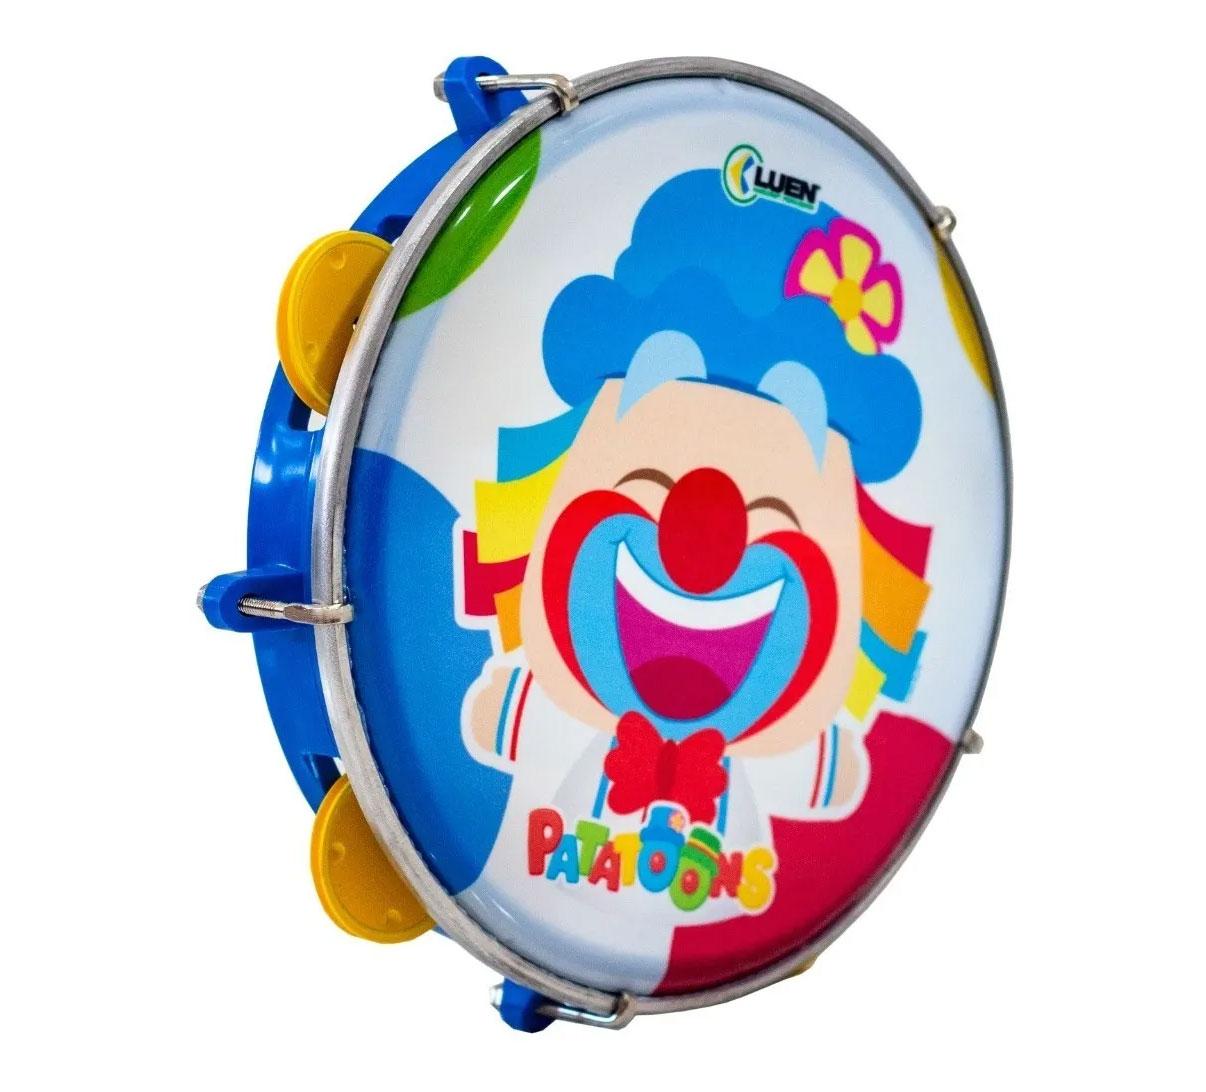 "Pandeiro Infantil Luen Patati Patata Azul 8""  - MegaLojaSP"